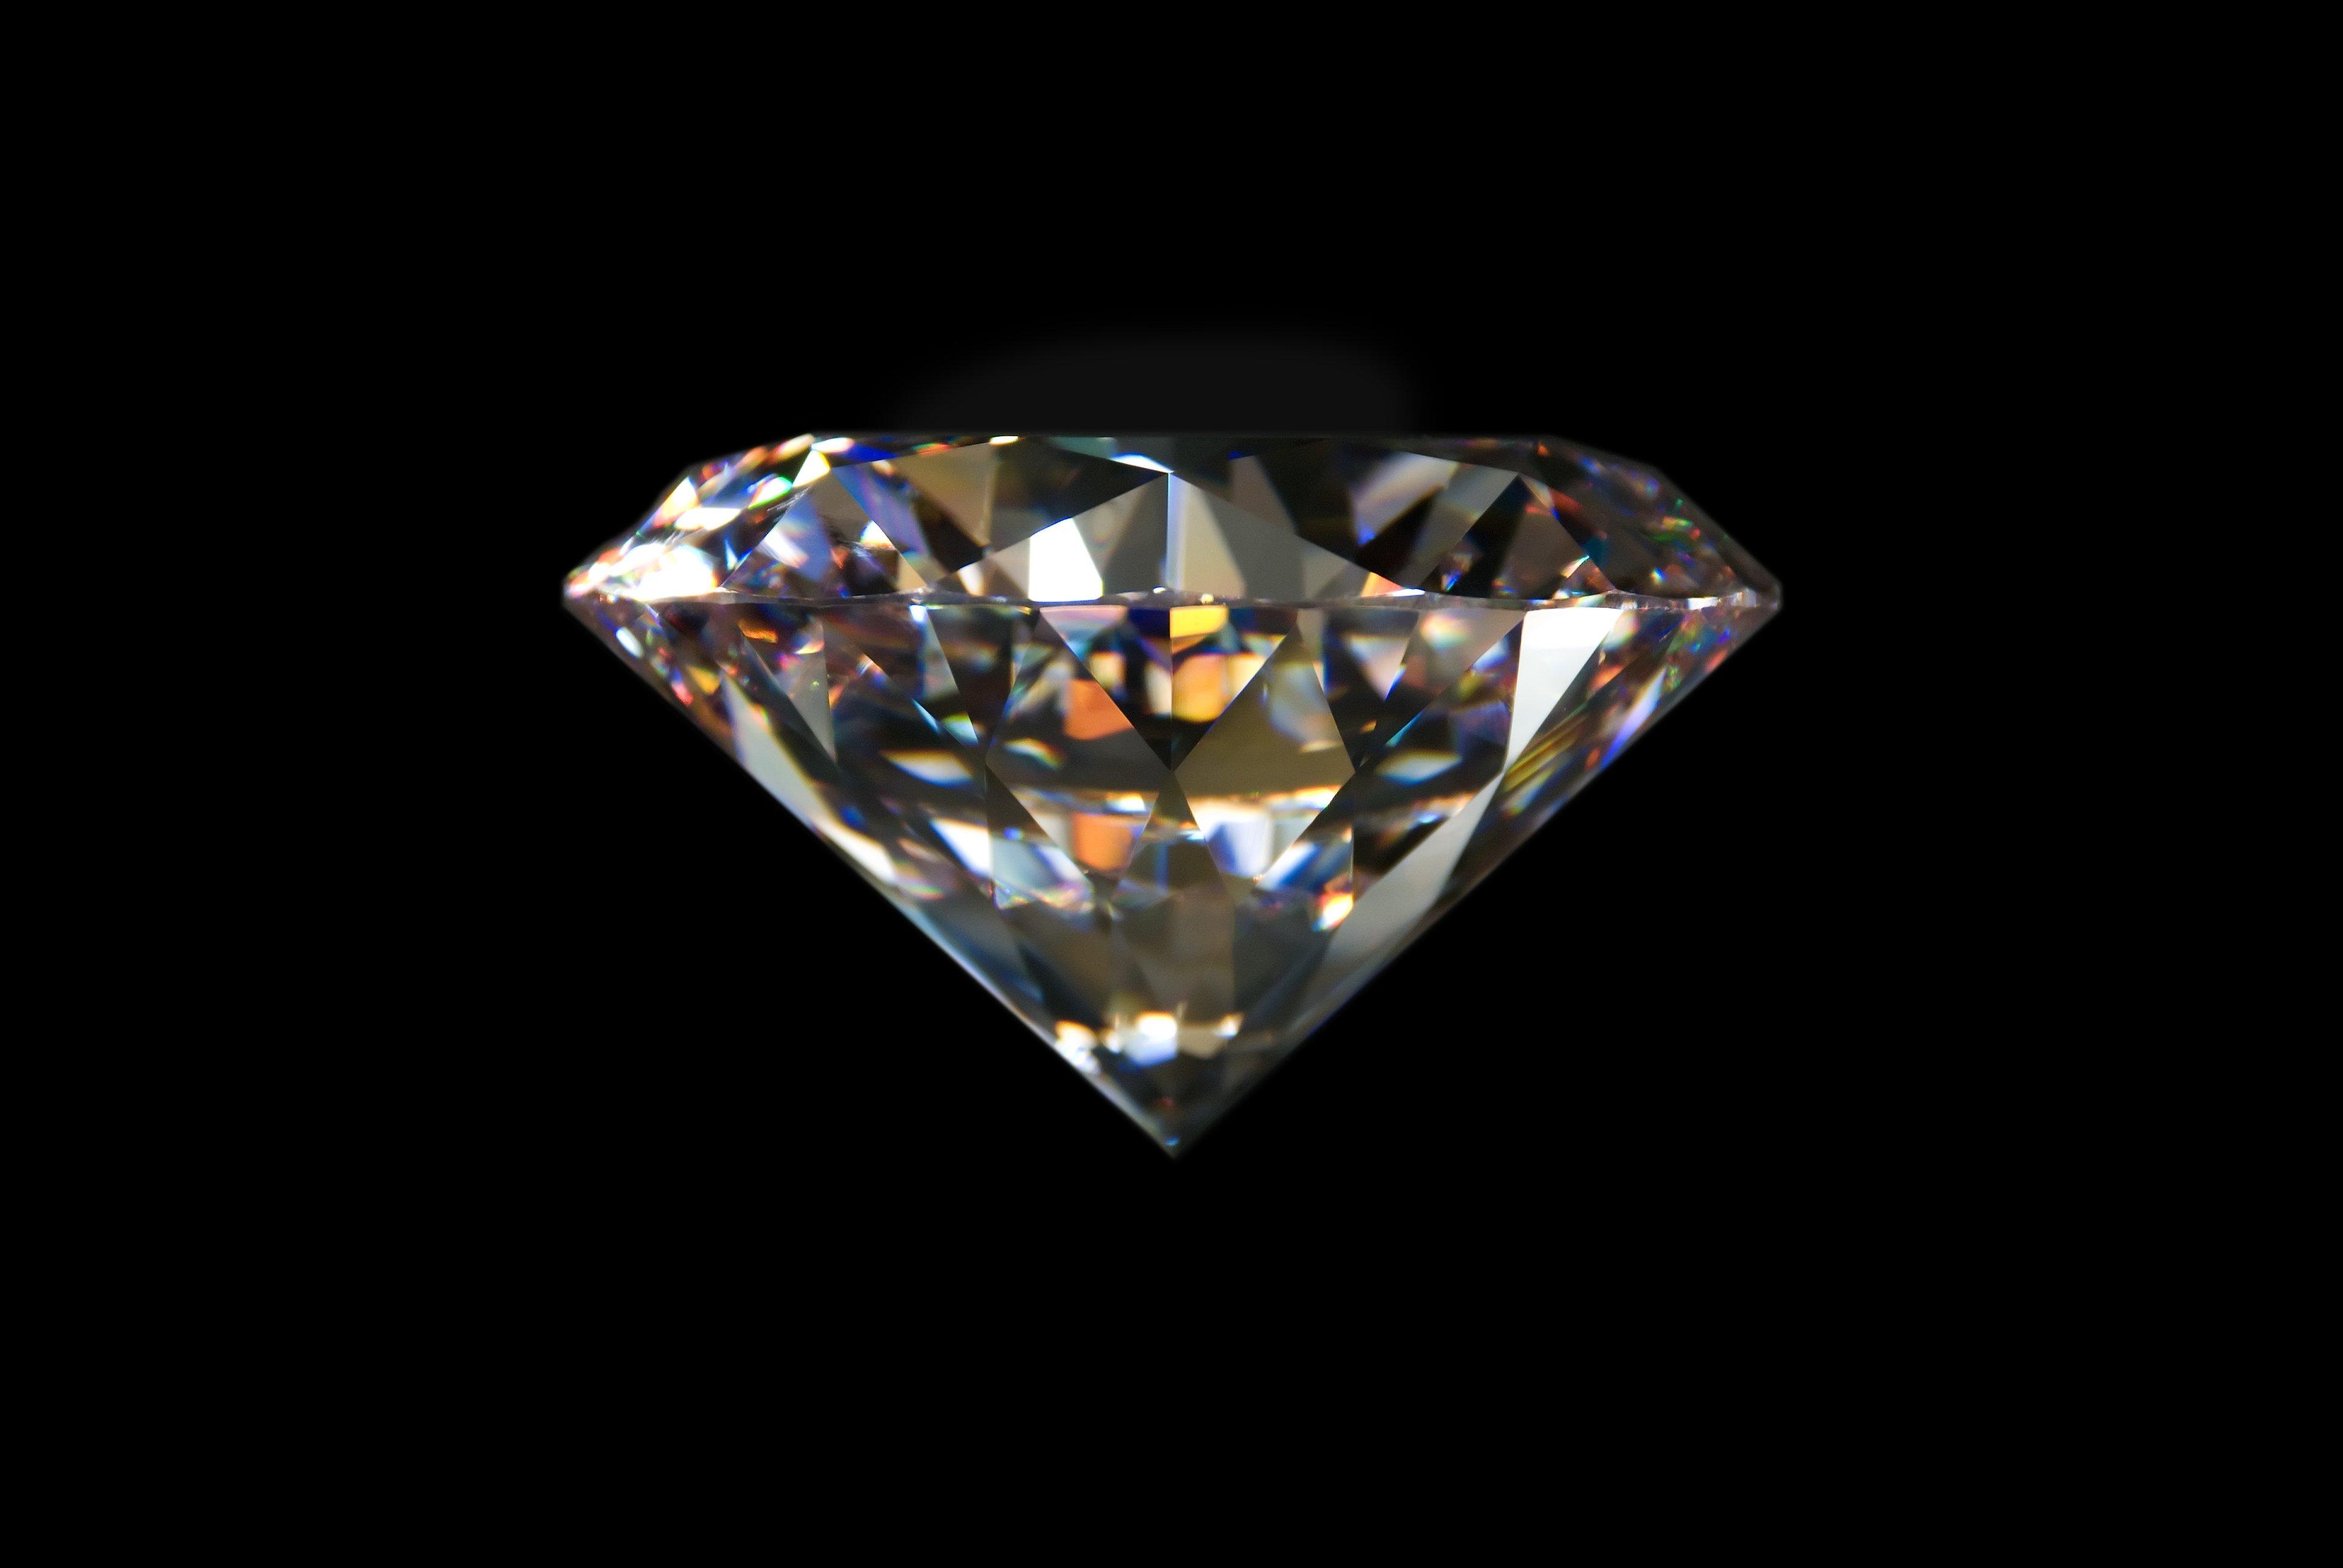 diamonds diamond jewelery bokeh bling abstraction abstract